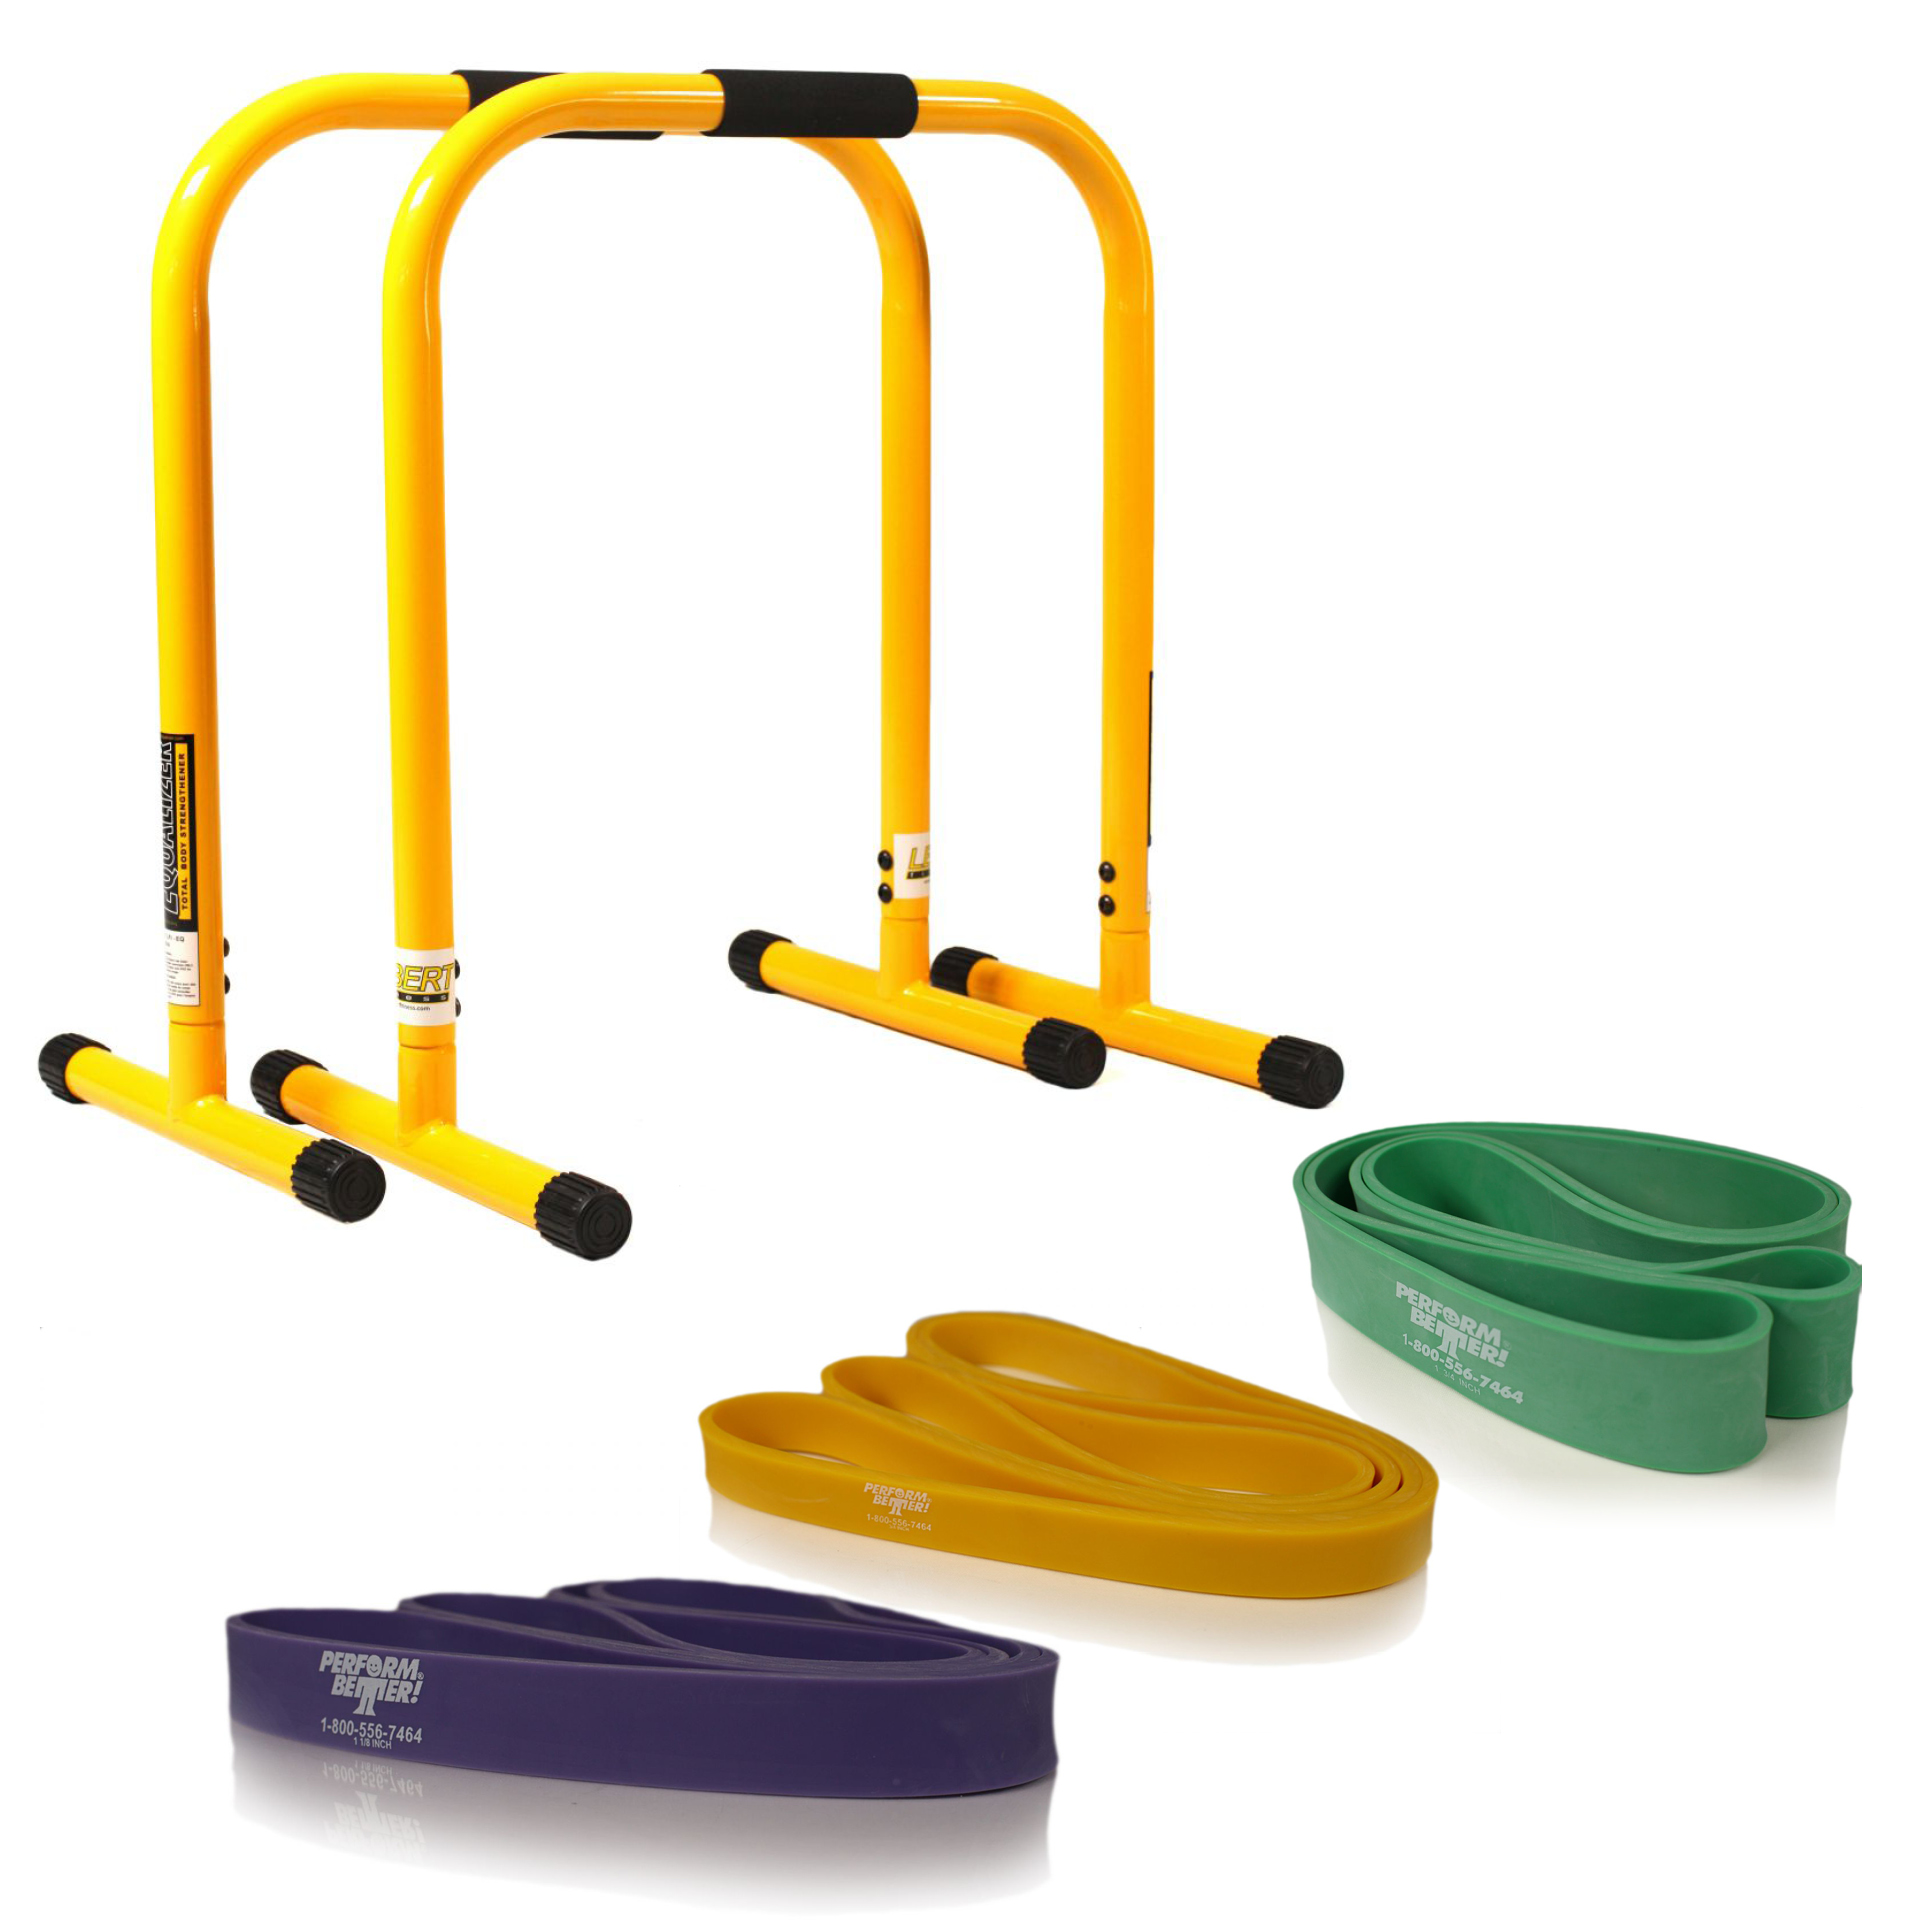 Lebert Equalizer gelb + Superband lila, gelb, grün (Set)